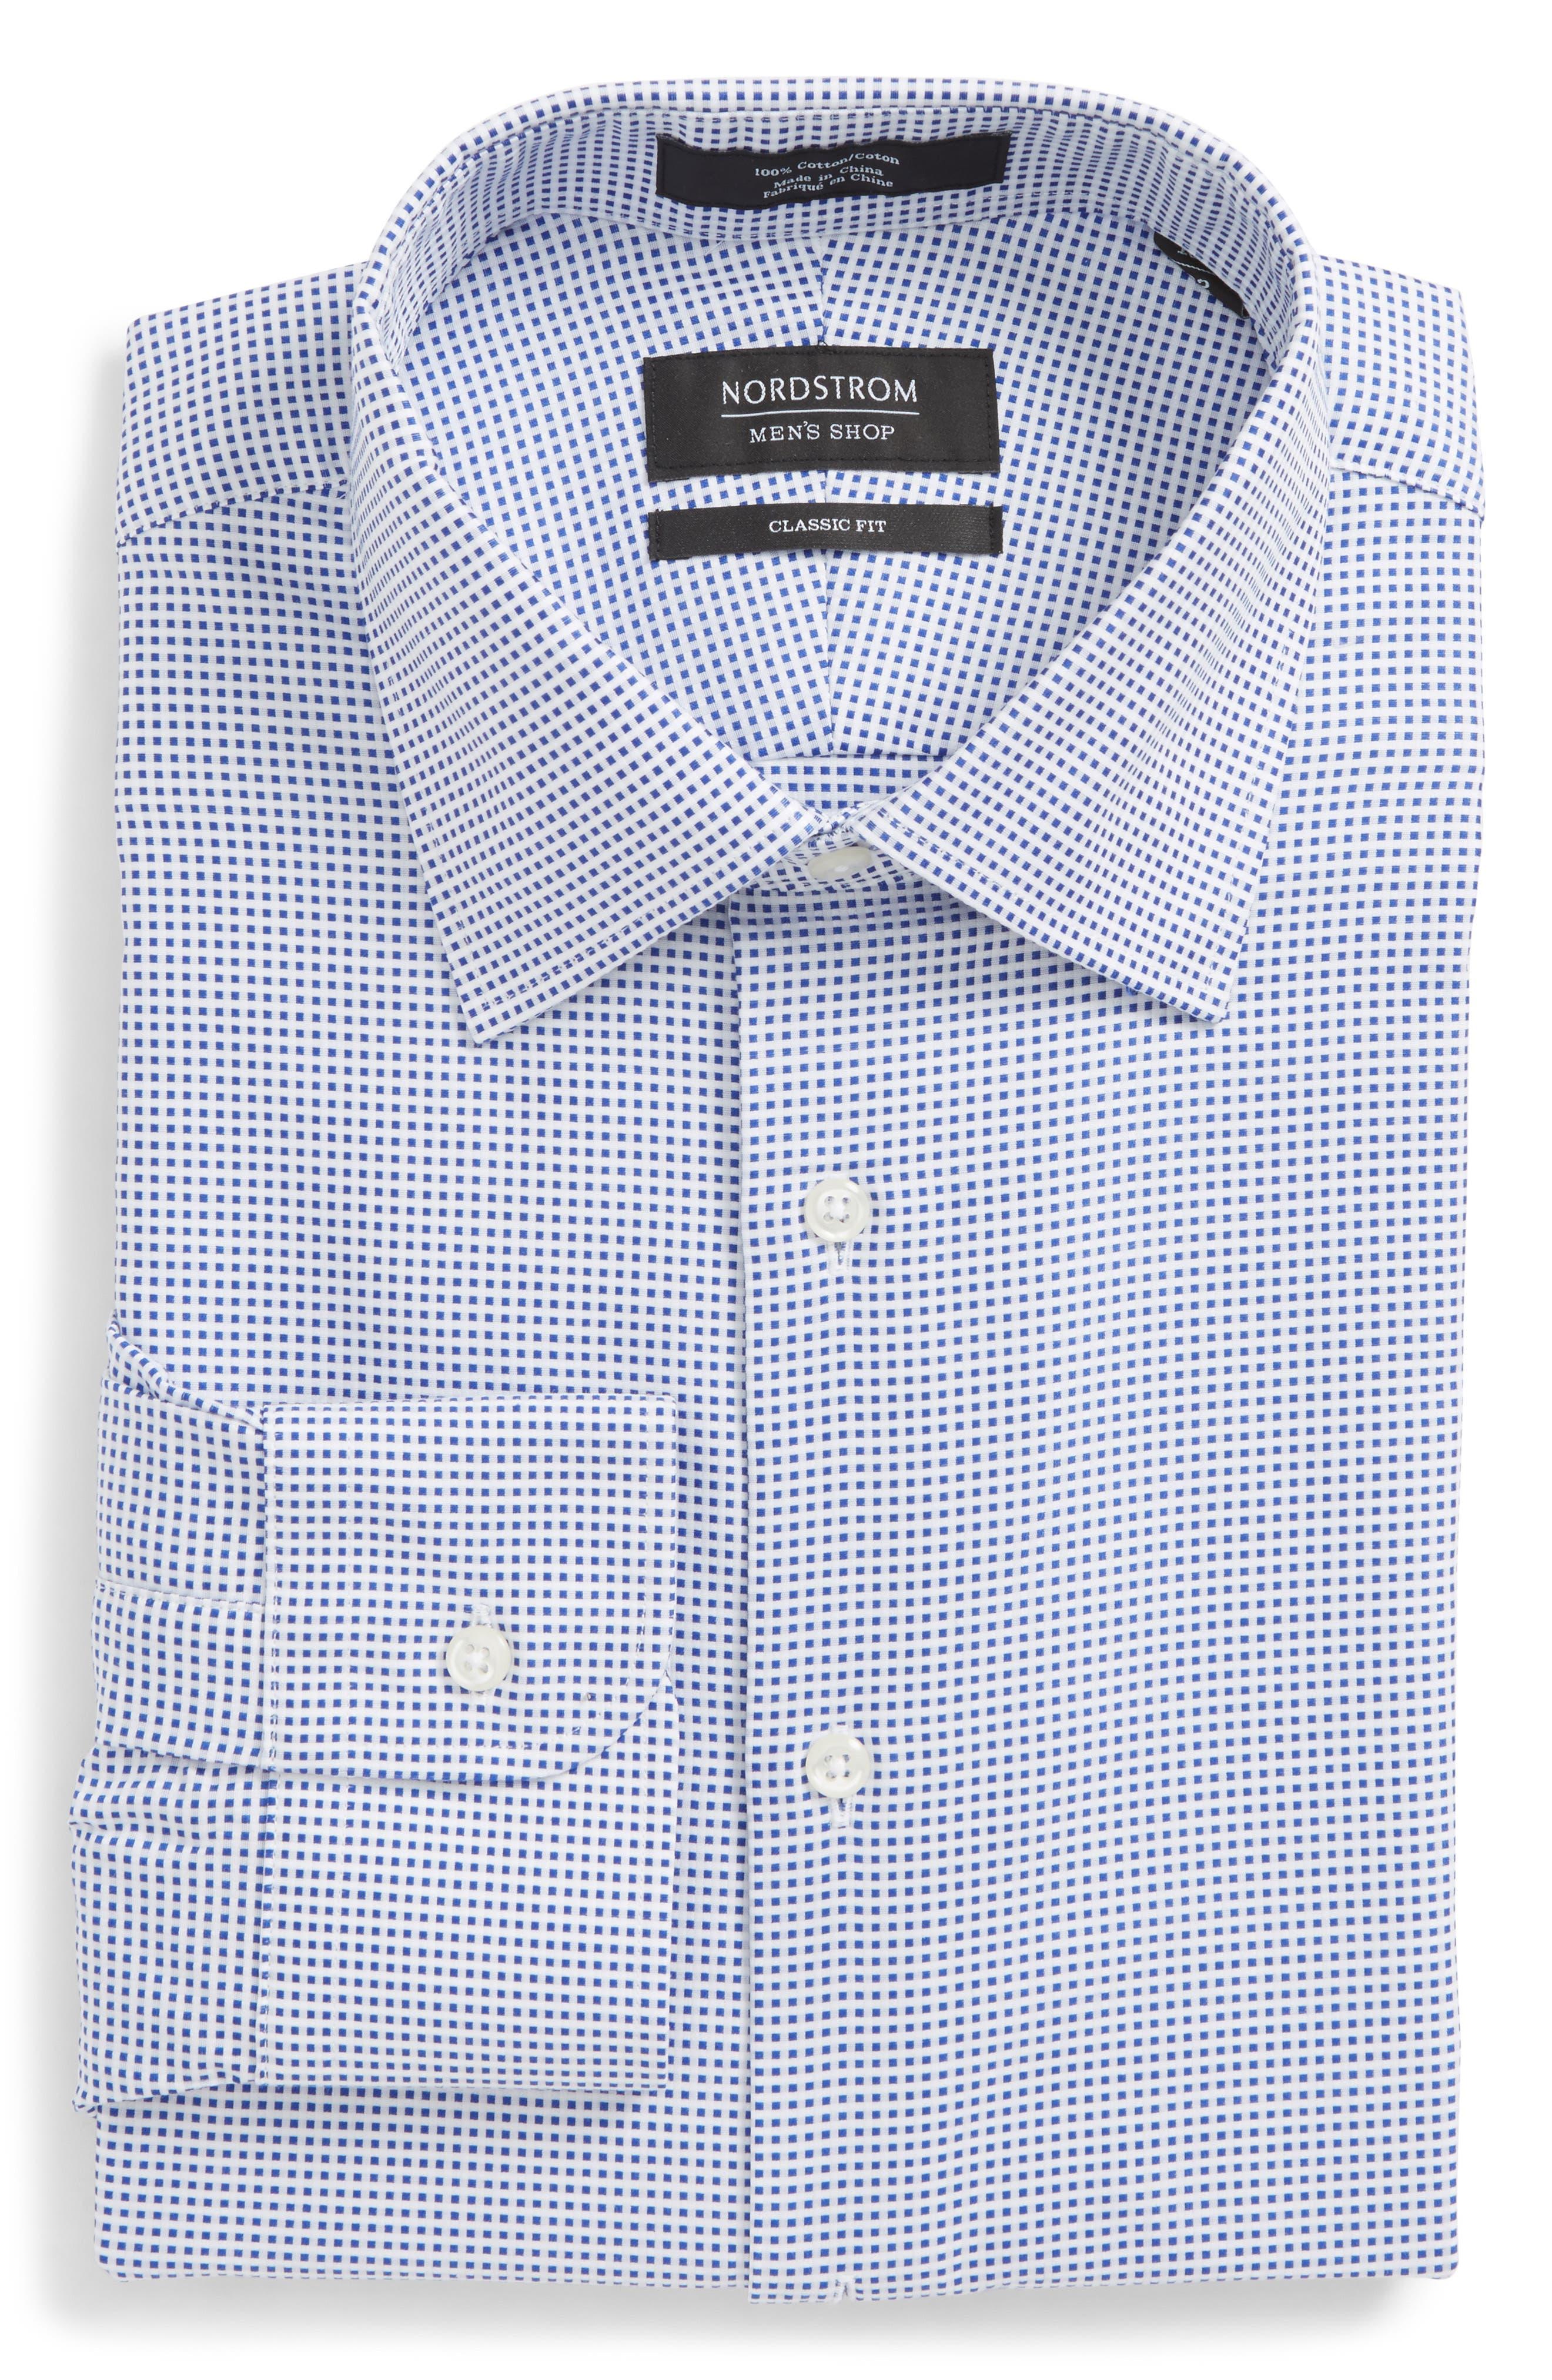 Nordstrom Men's Shop Classic Fit Microcheck Dress Shirt